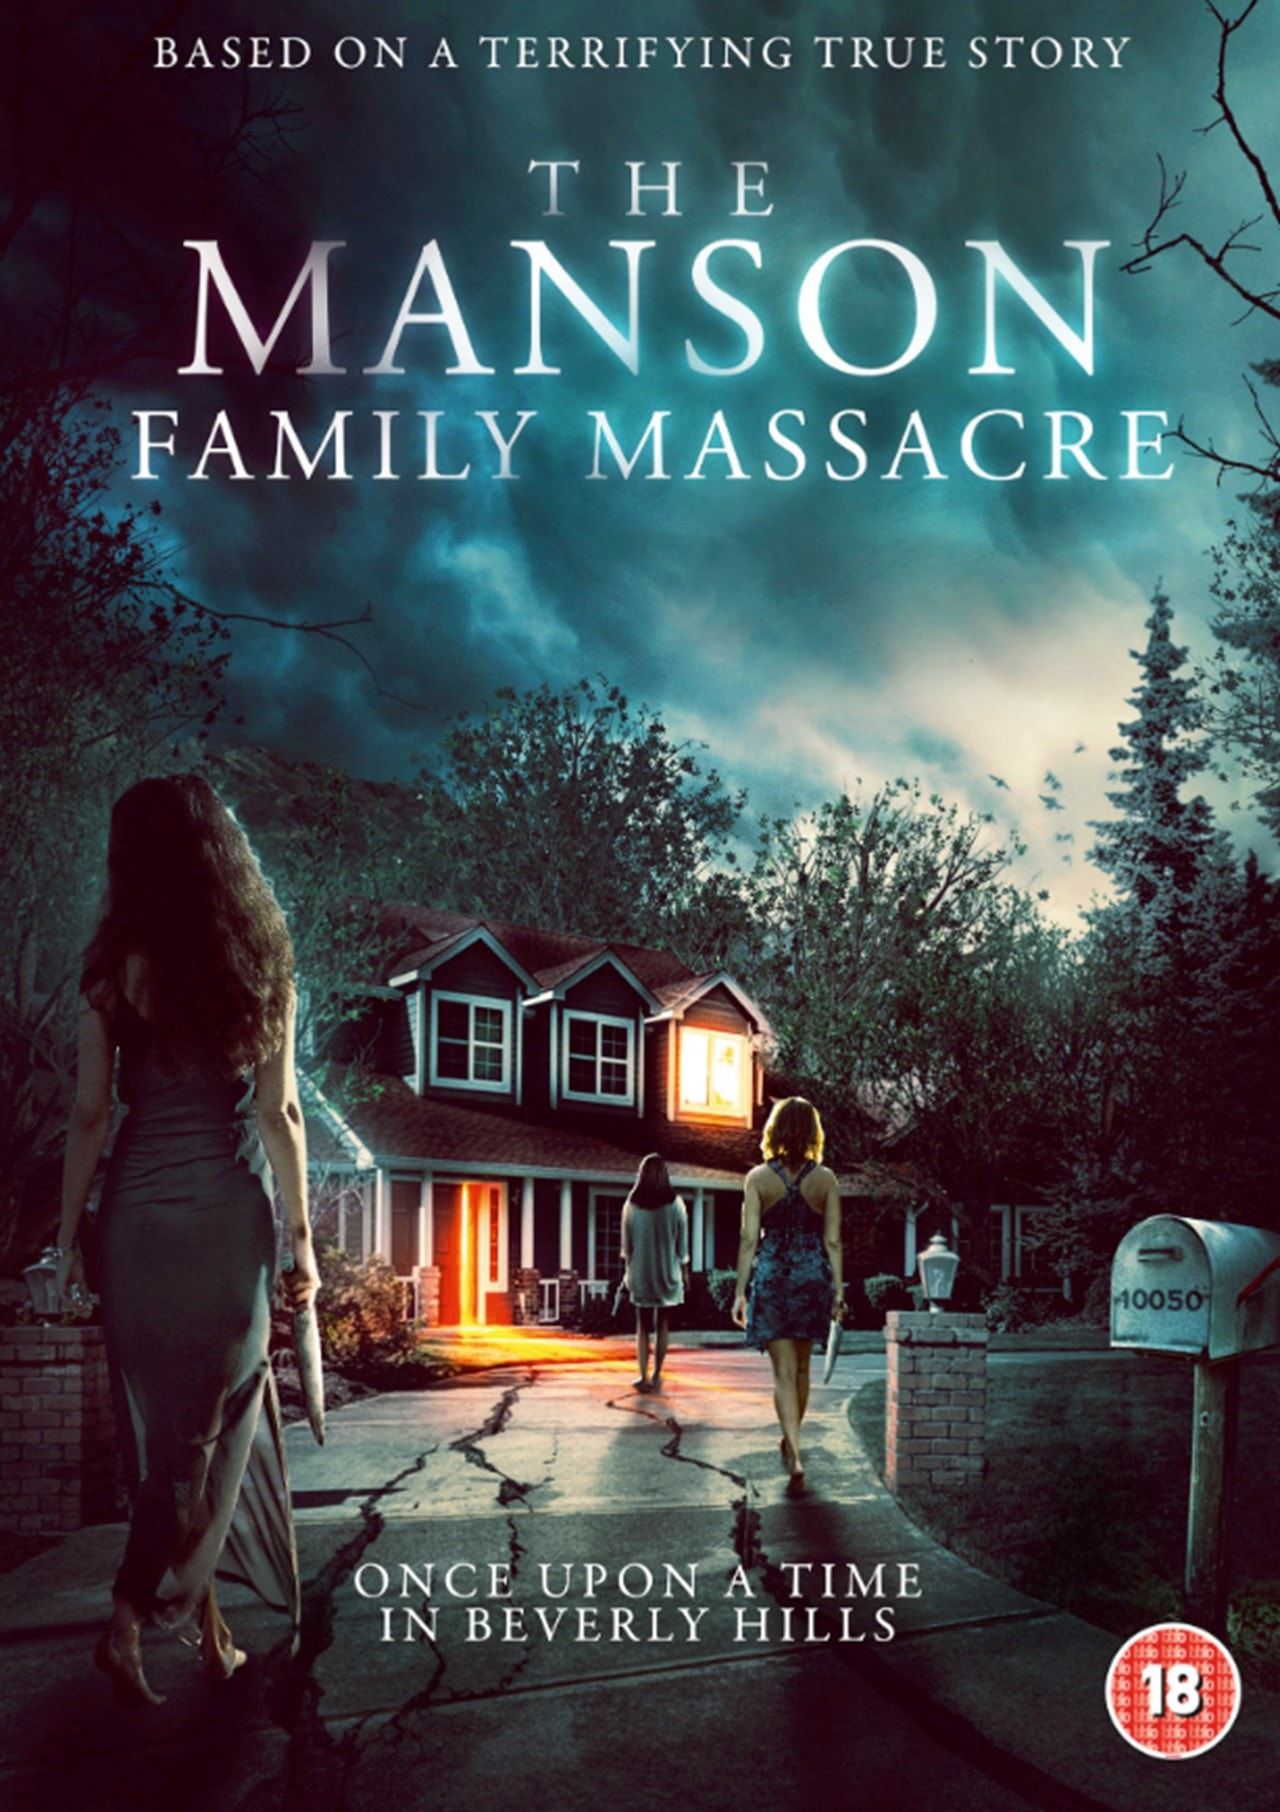 The Manson Family Massacre - 1